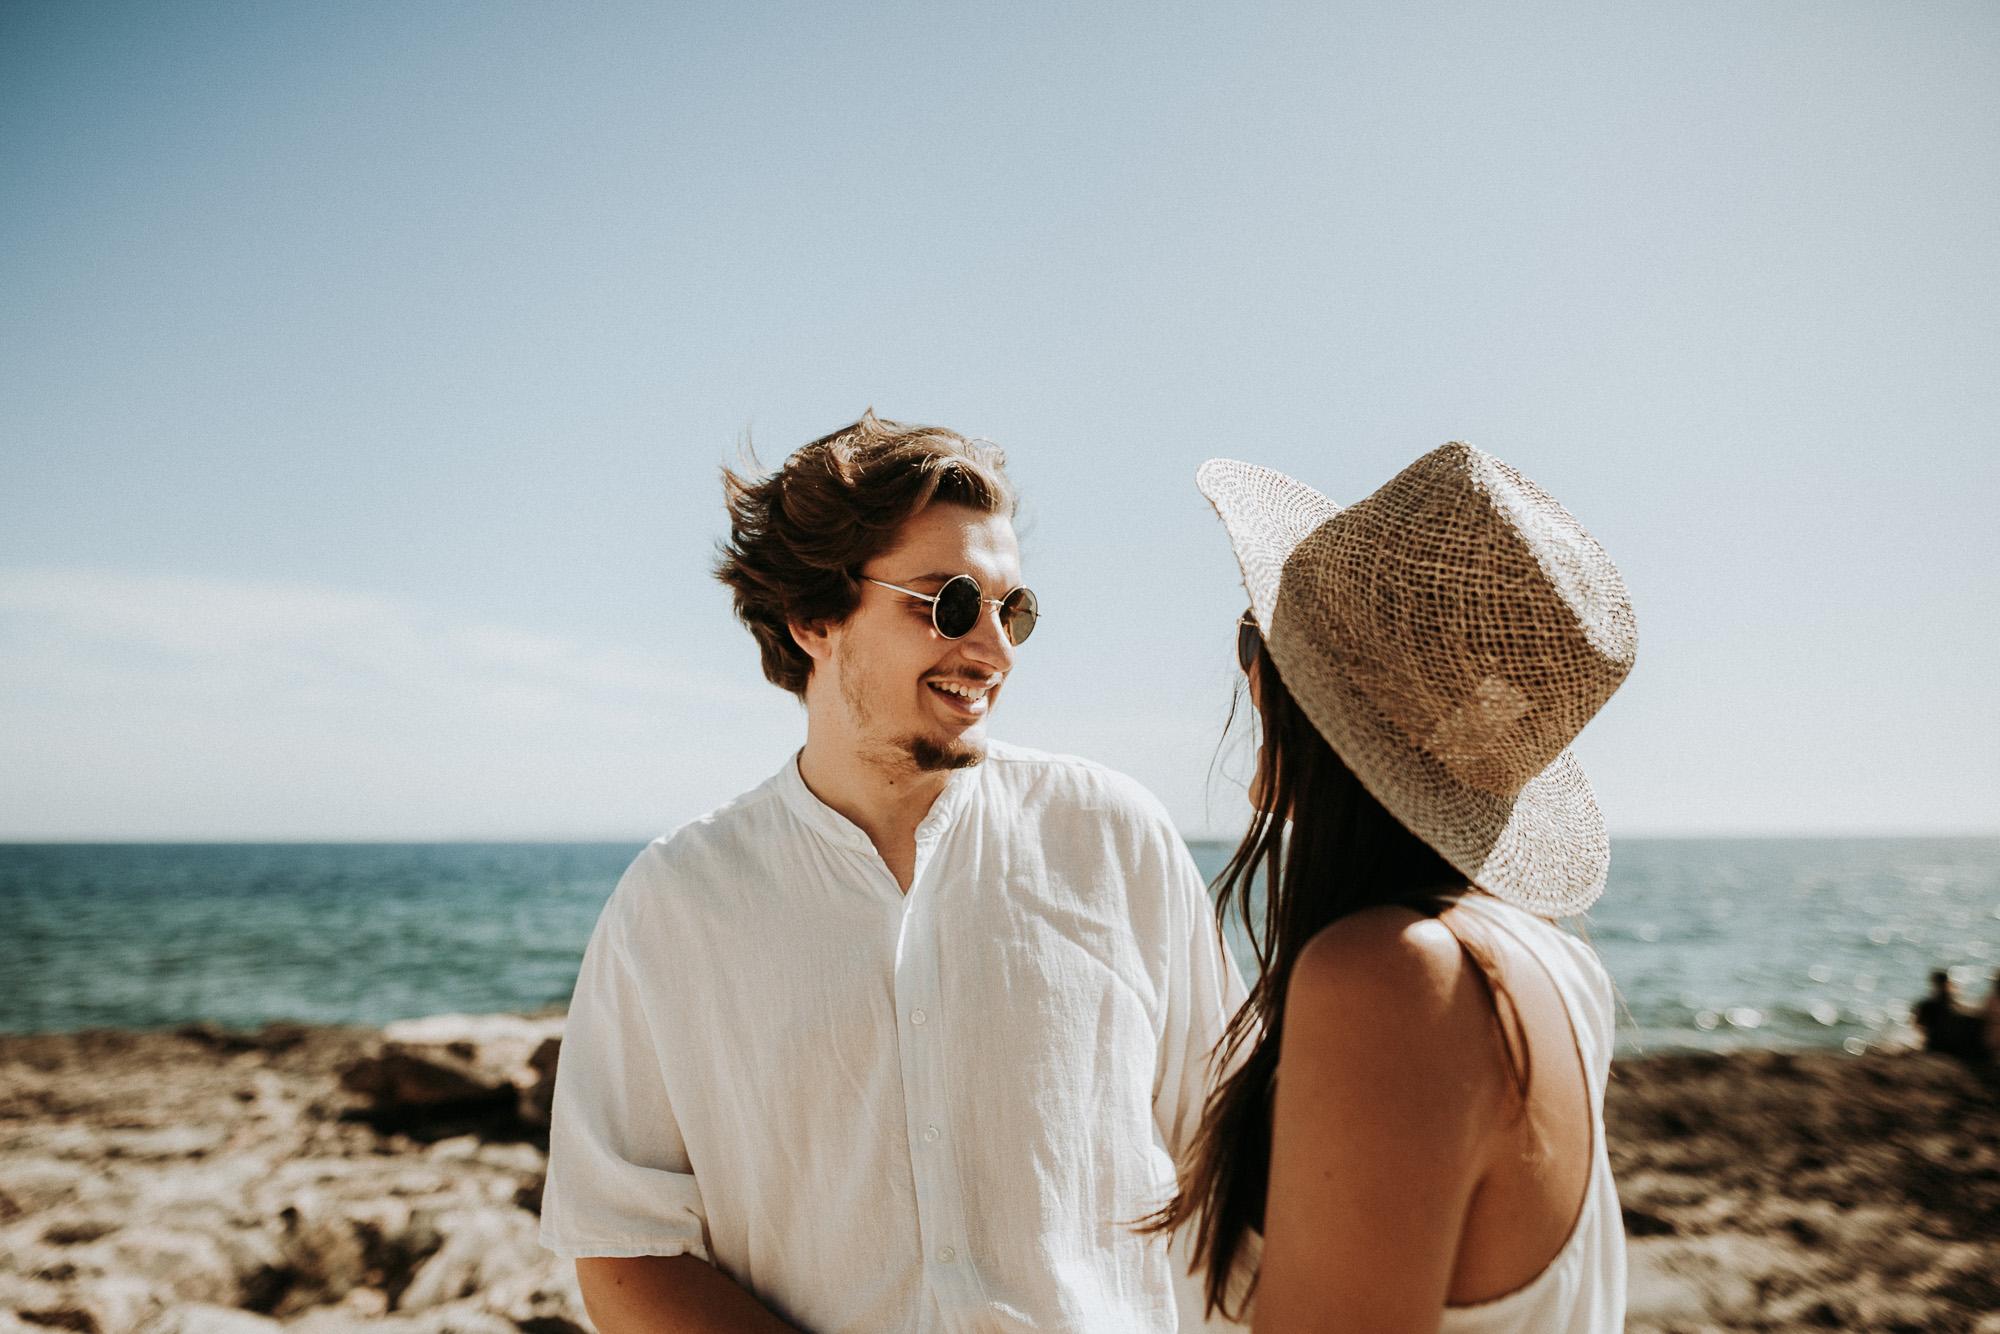 DanielaMarquardtPhotography_wedding_elopement_mallorca_spain_stjordi_sessalines_marinaandxavi372